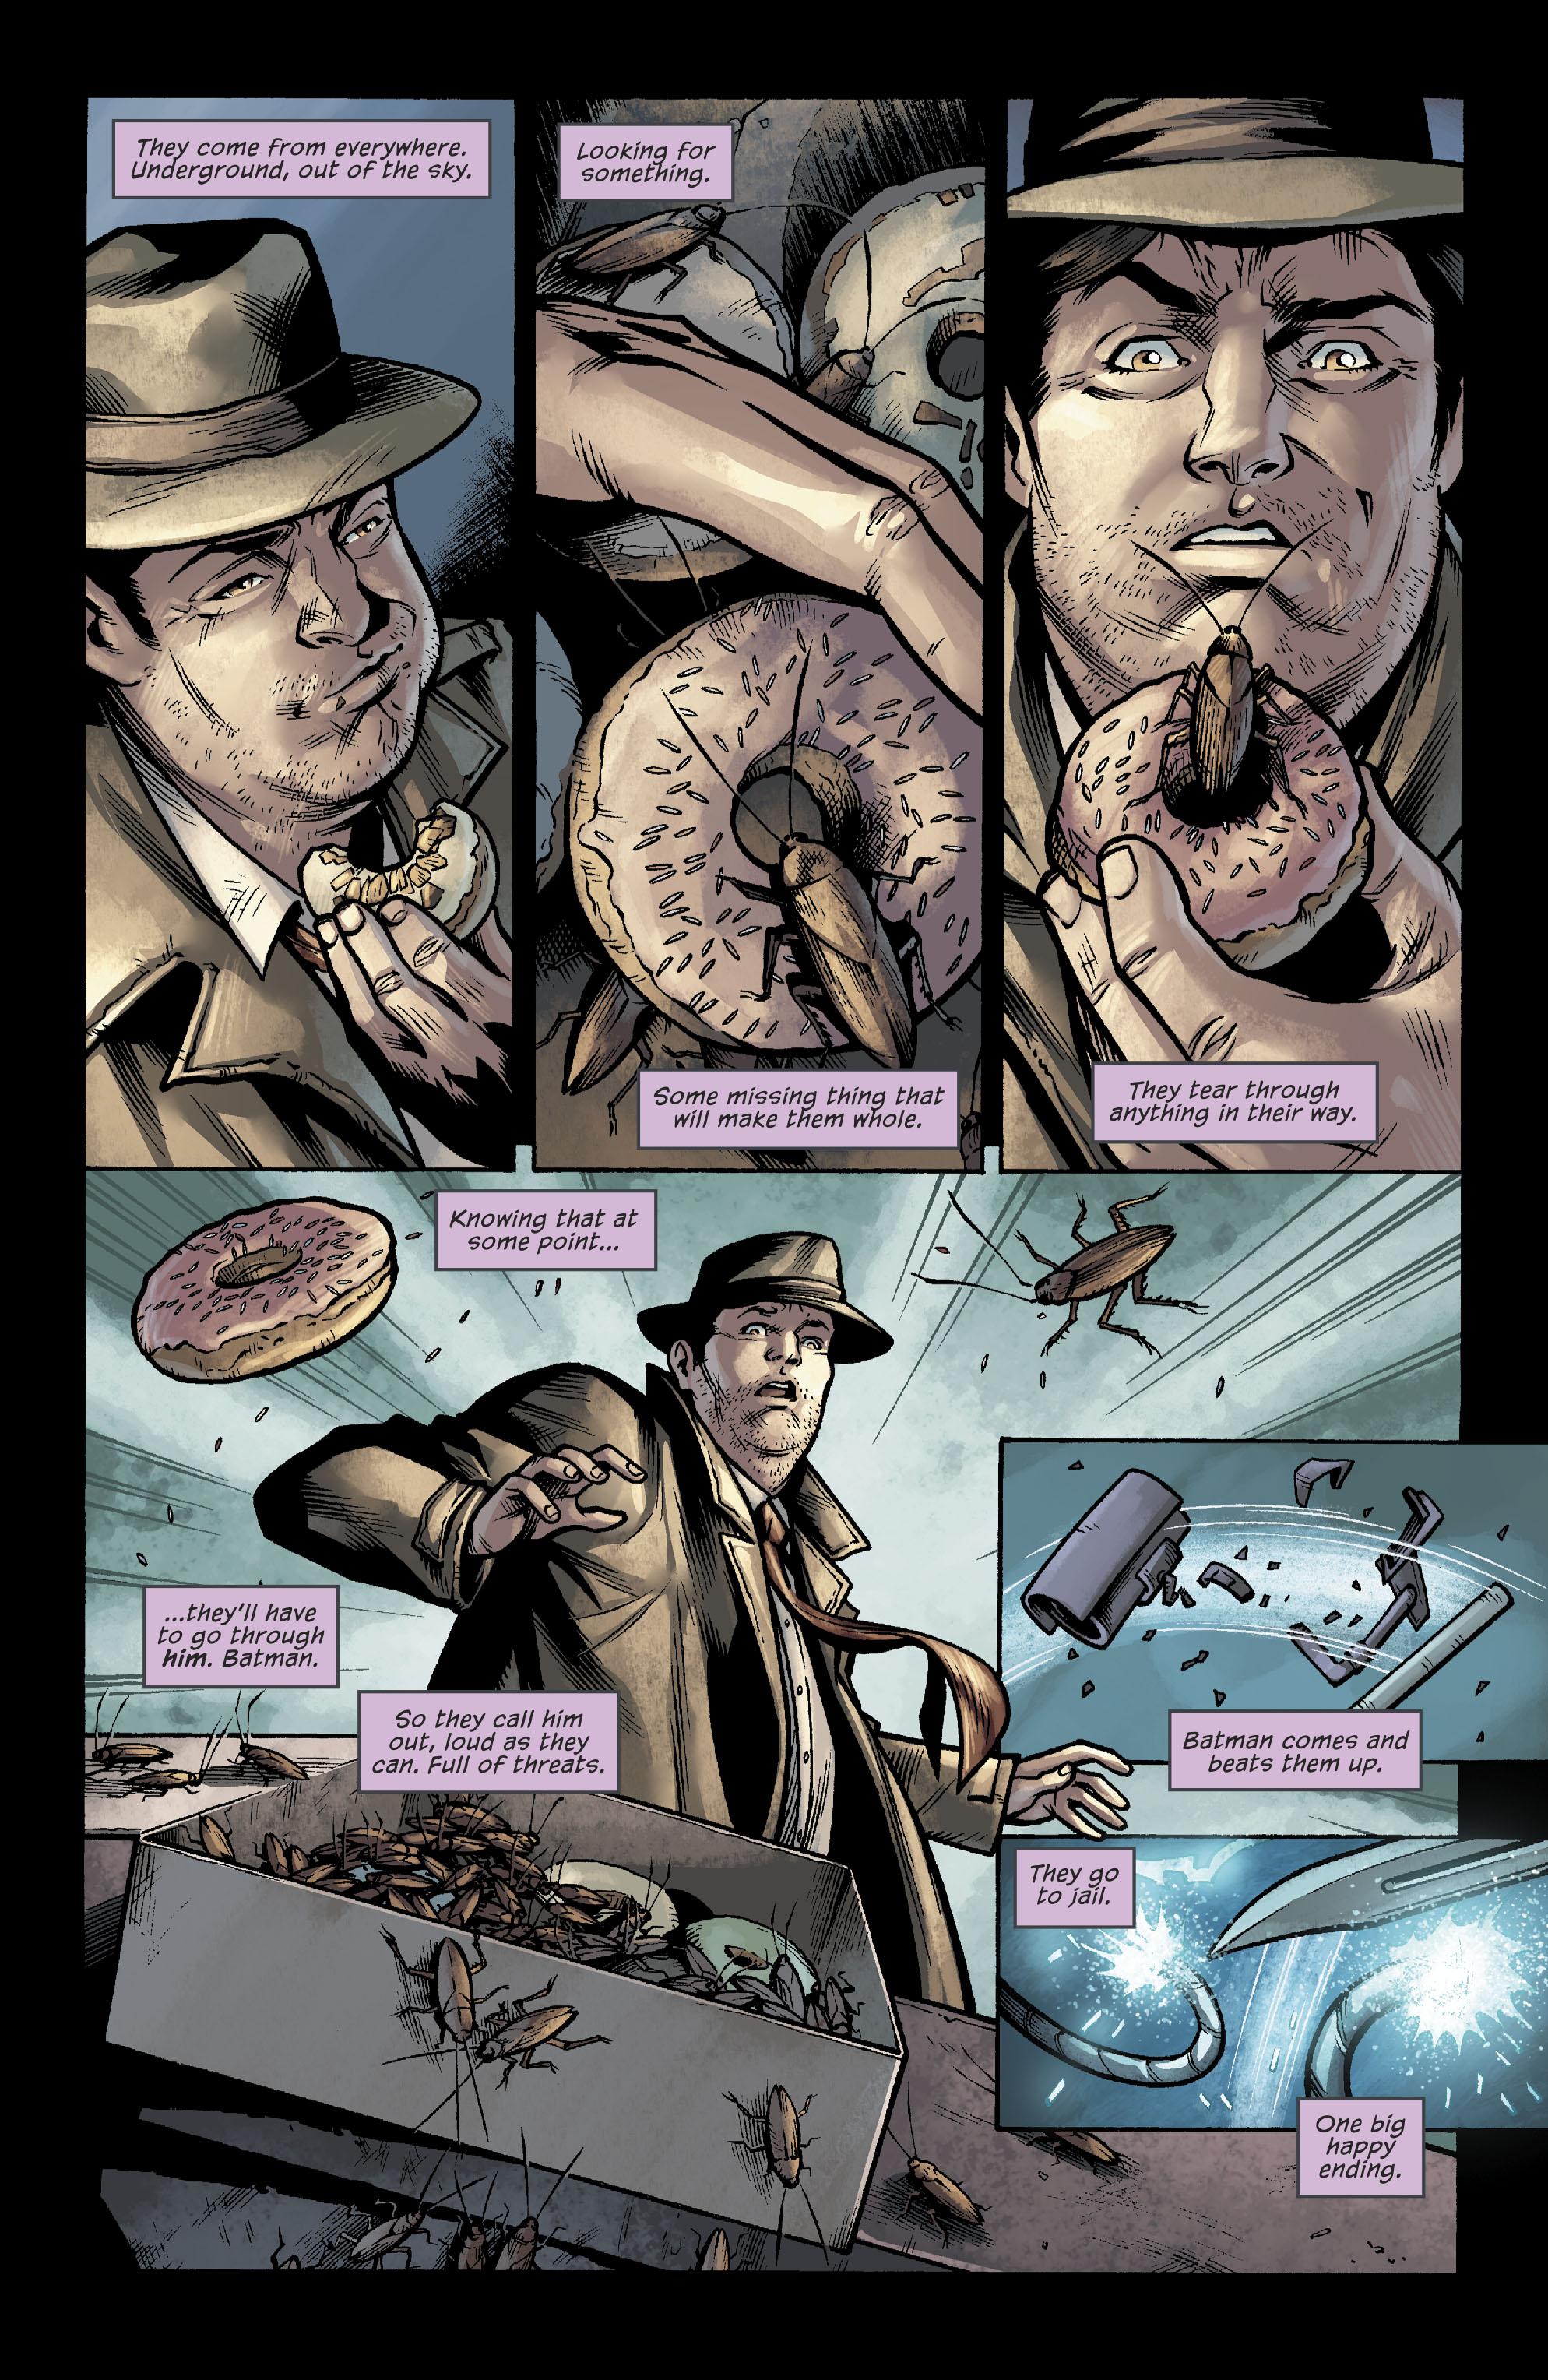 Read online Detective Comics (2016) comic -  Issue #957 - 5